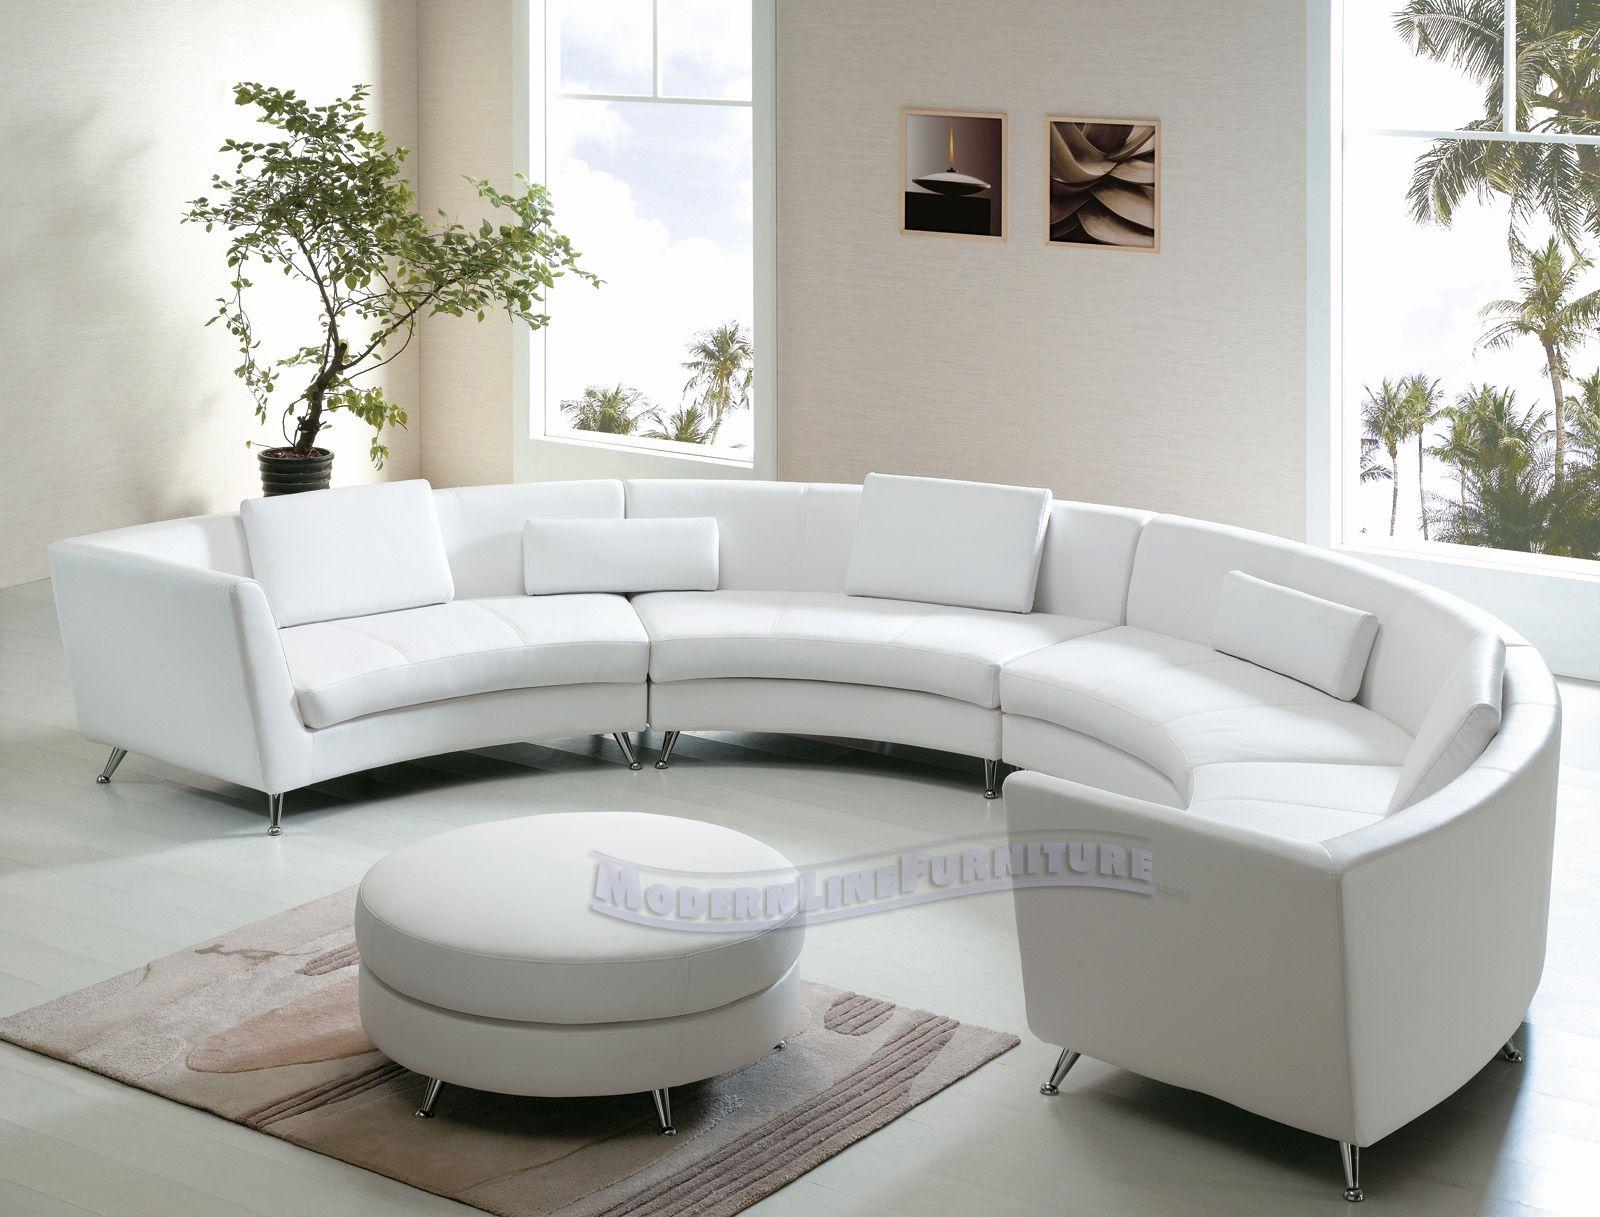 Astounding Amazing Contemporary Round Sofa Photograpy Contemporary Machost Co Dining Chair Design Ideas Machostcouk